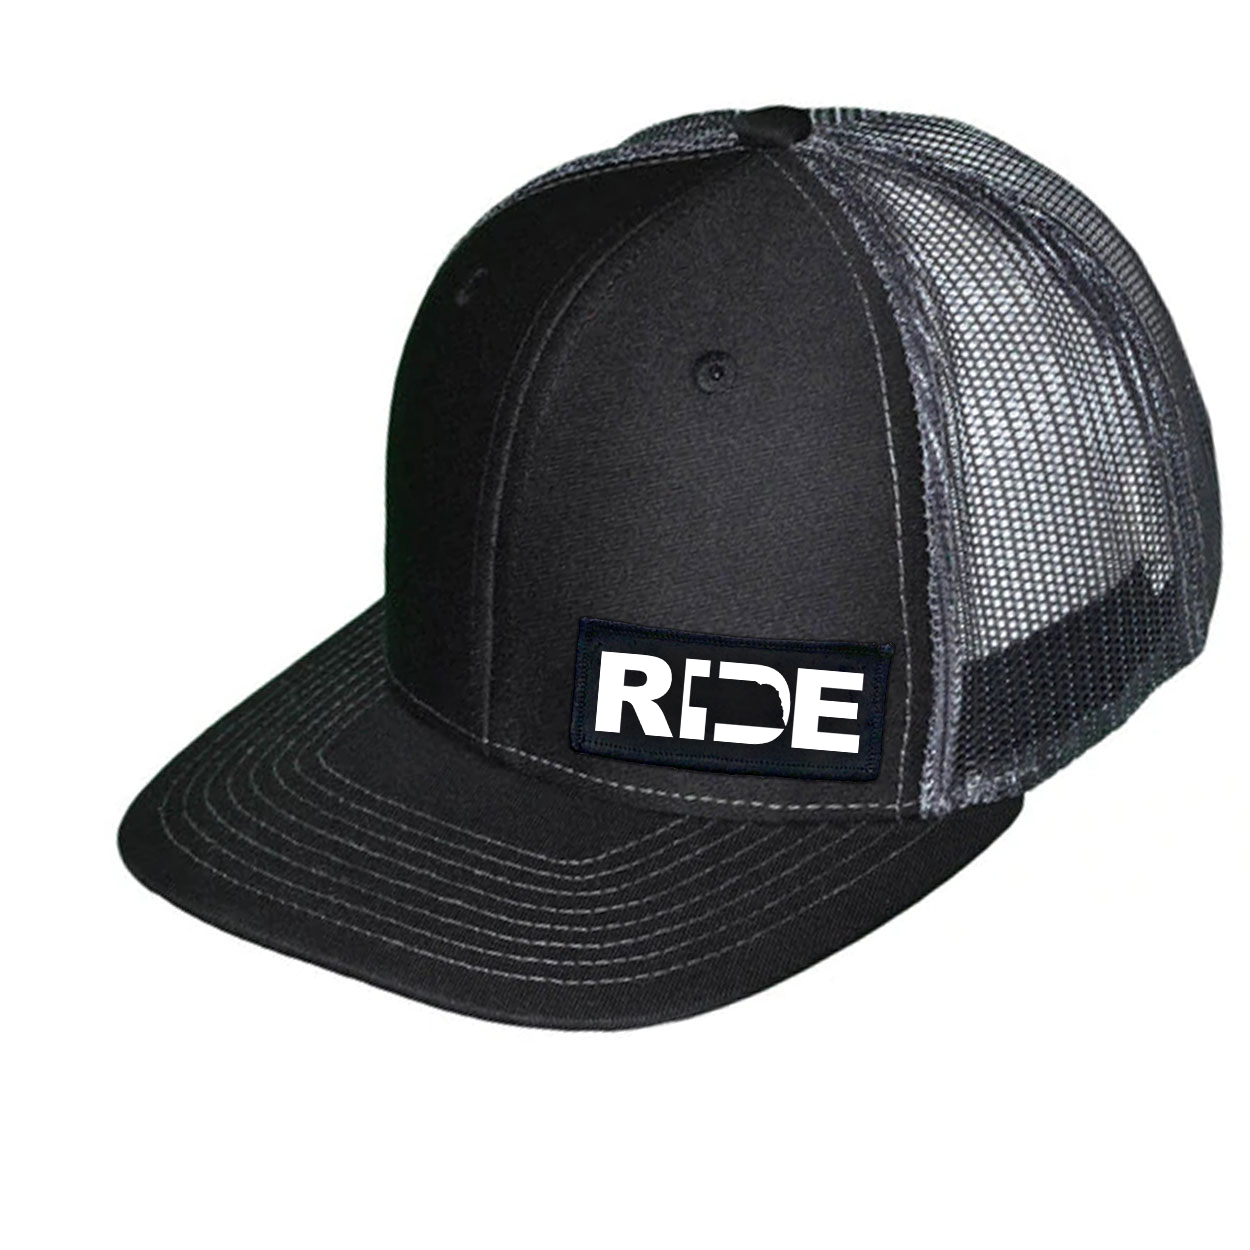 Ride Nebraska Night Out Woven Patch Snapback Trucker Hat Black/Dark Gray (White Logo)